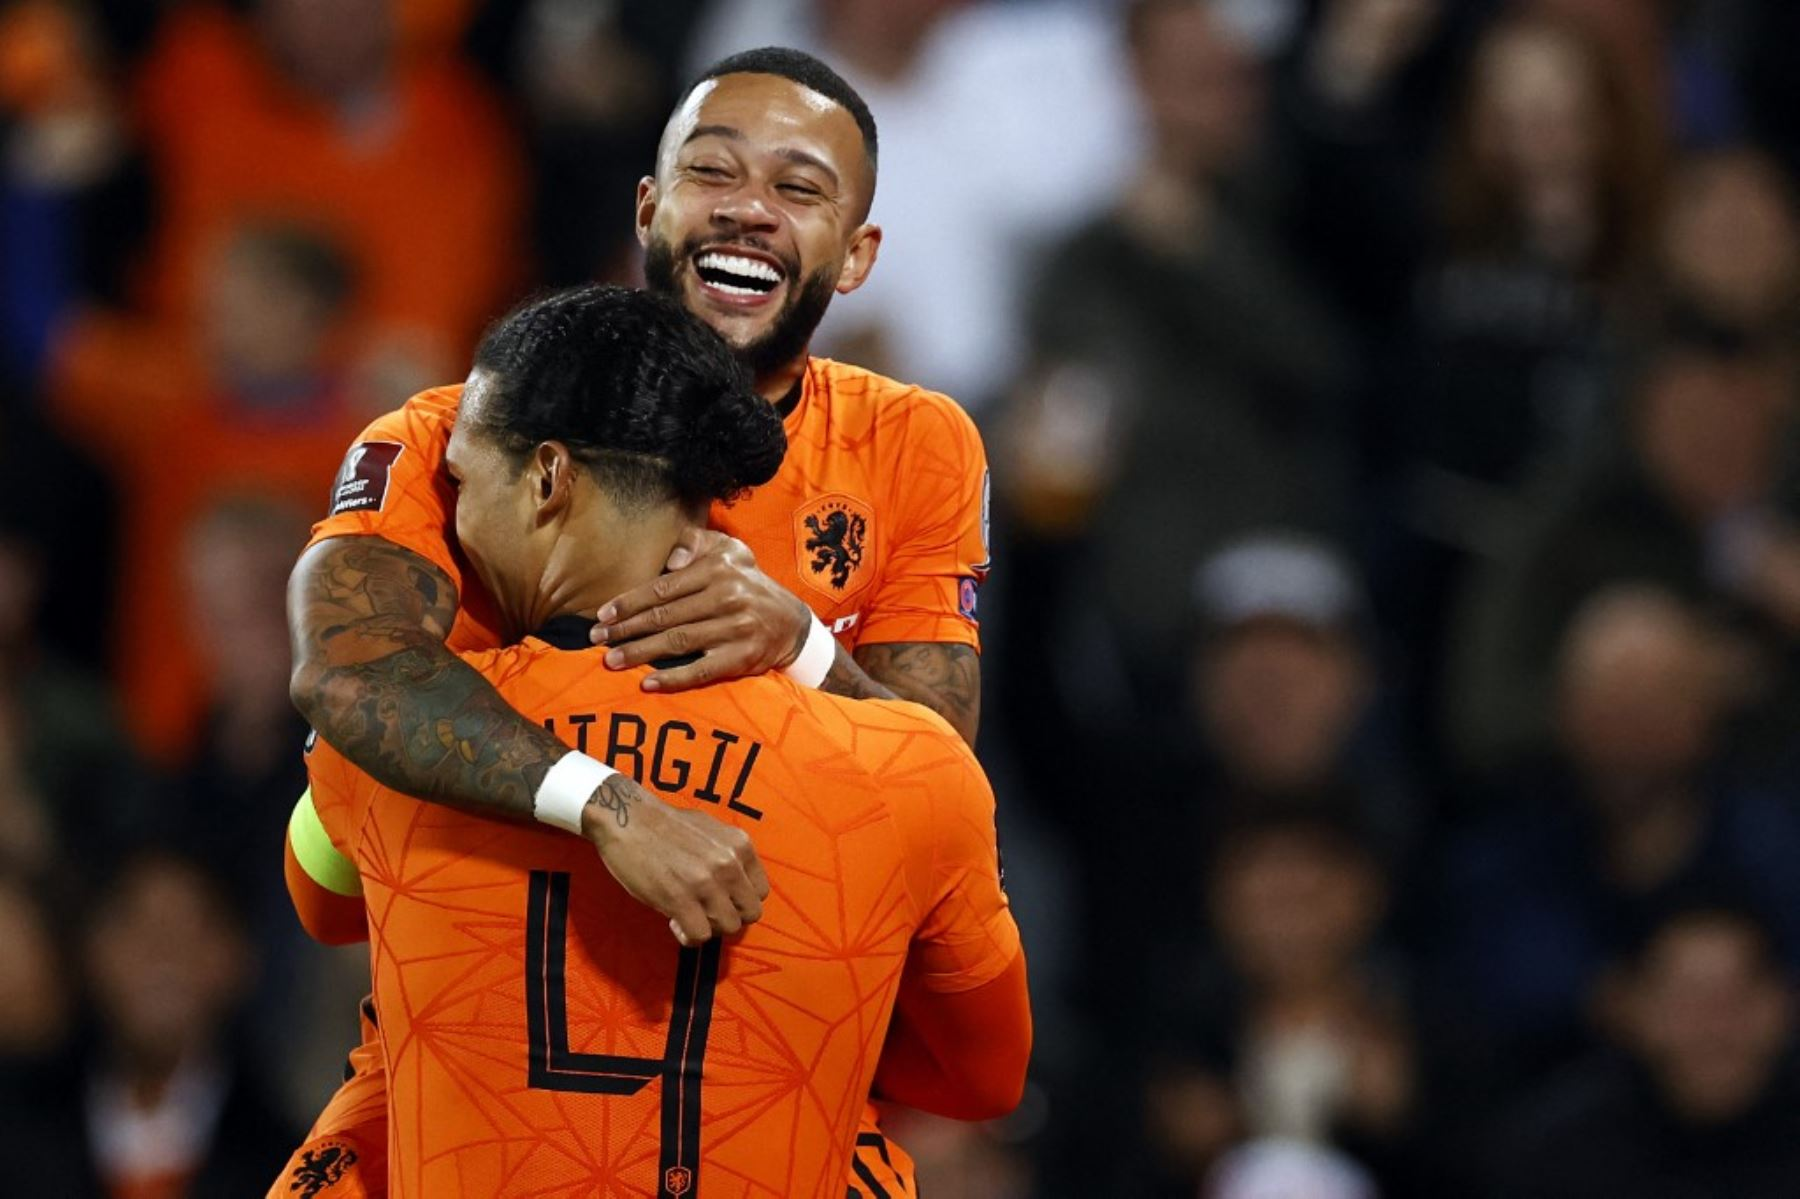 Alemania sacó boleto al Mundial Catar 2022, Holanda se acerca